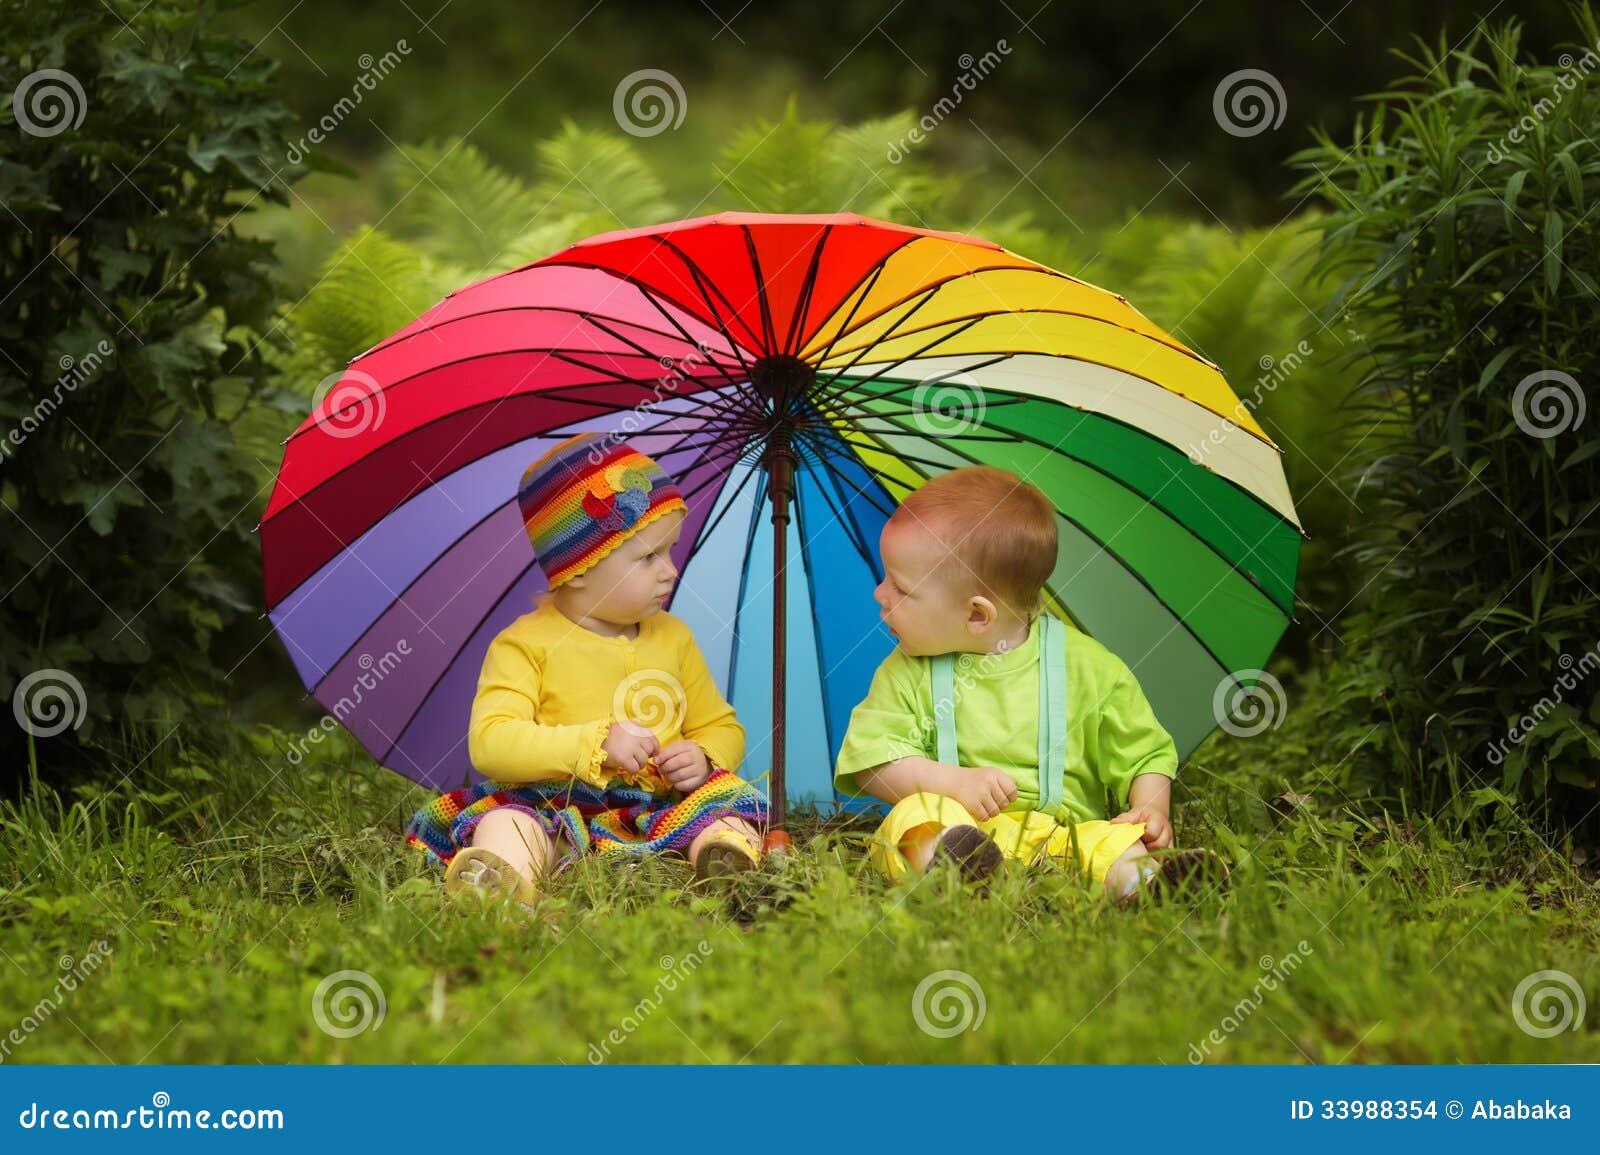 Little children under colorful umbrella